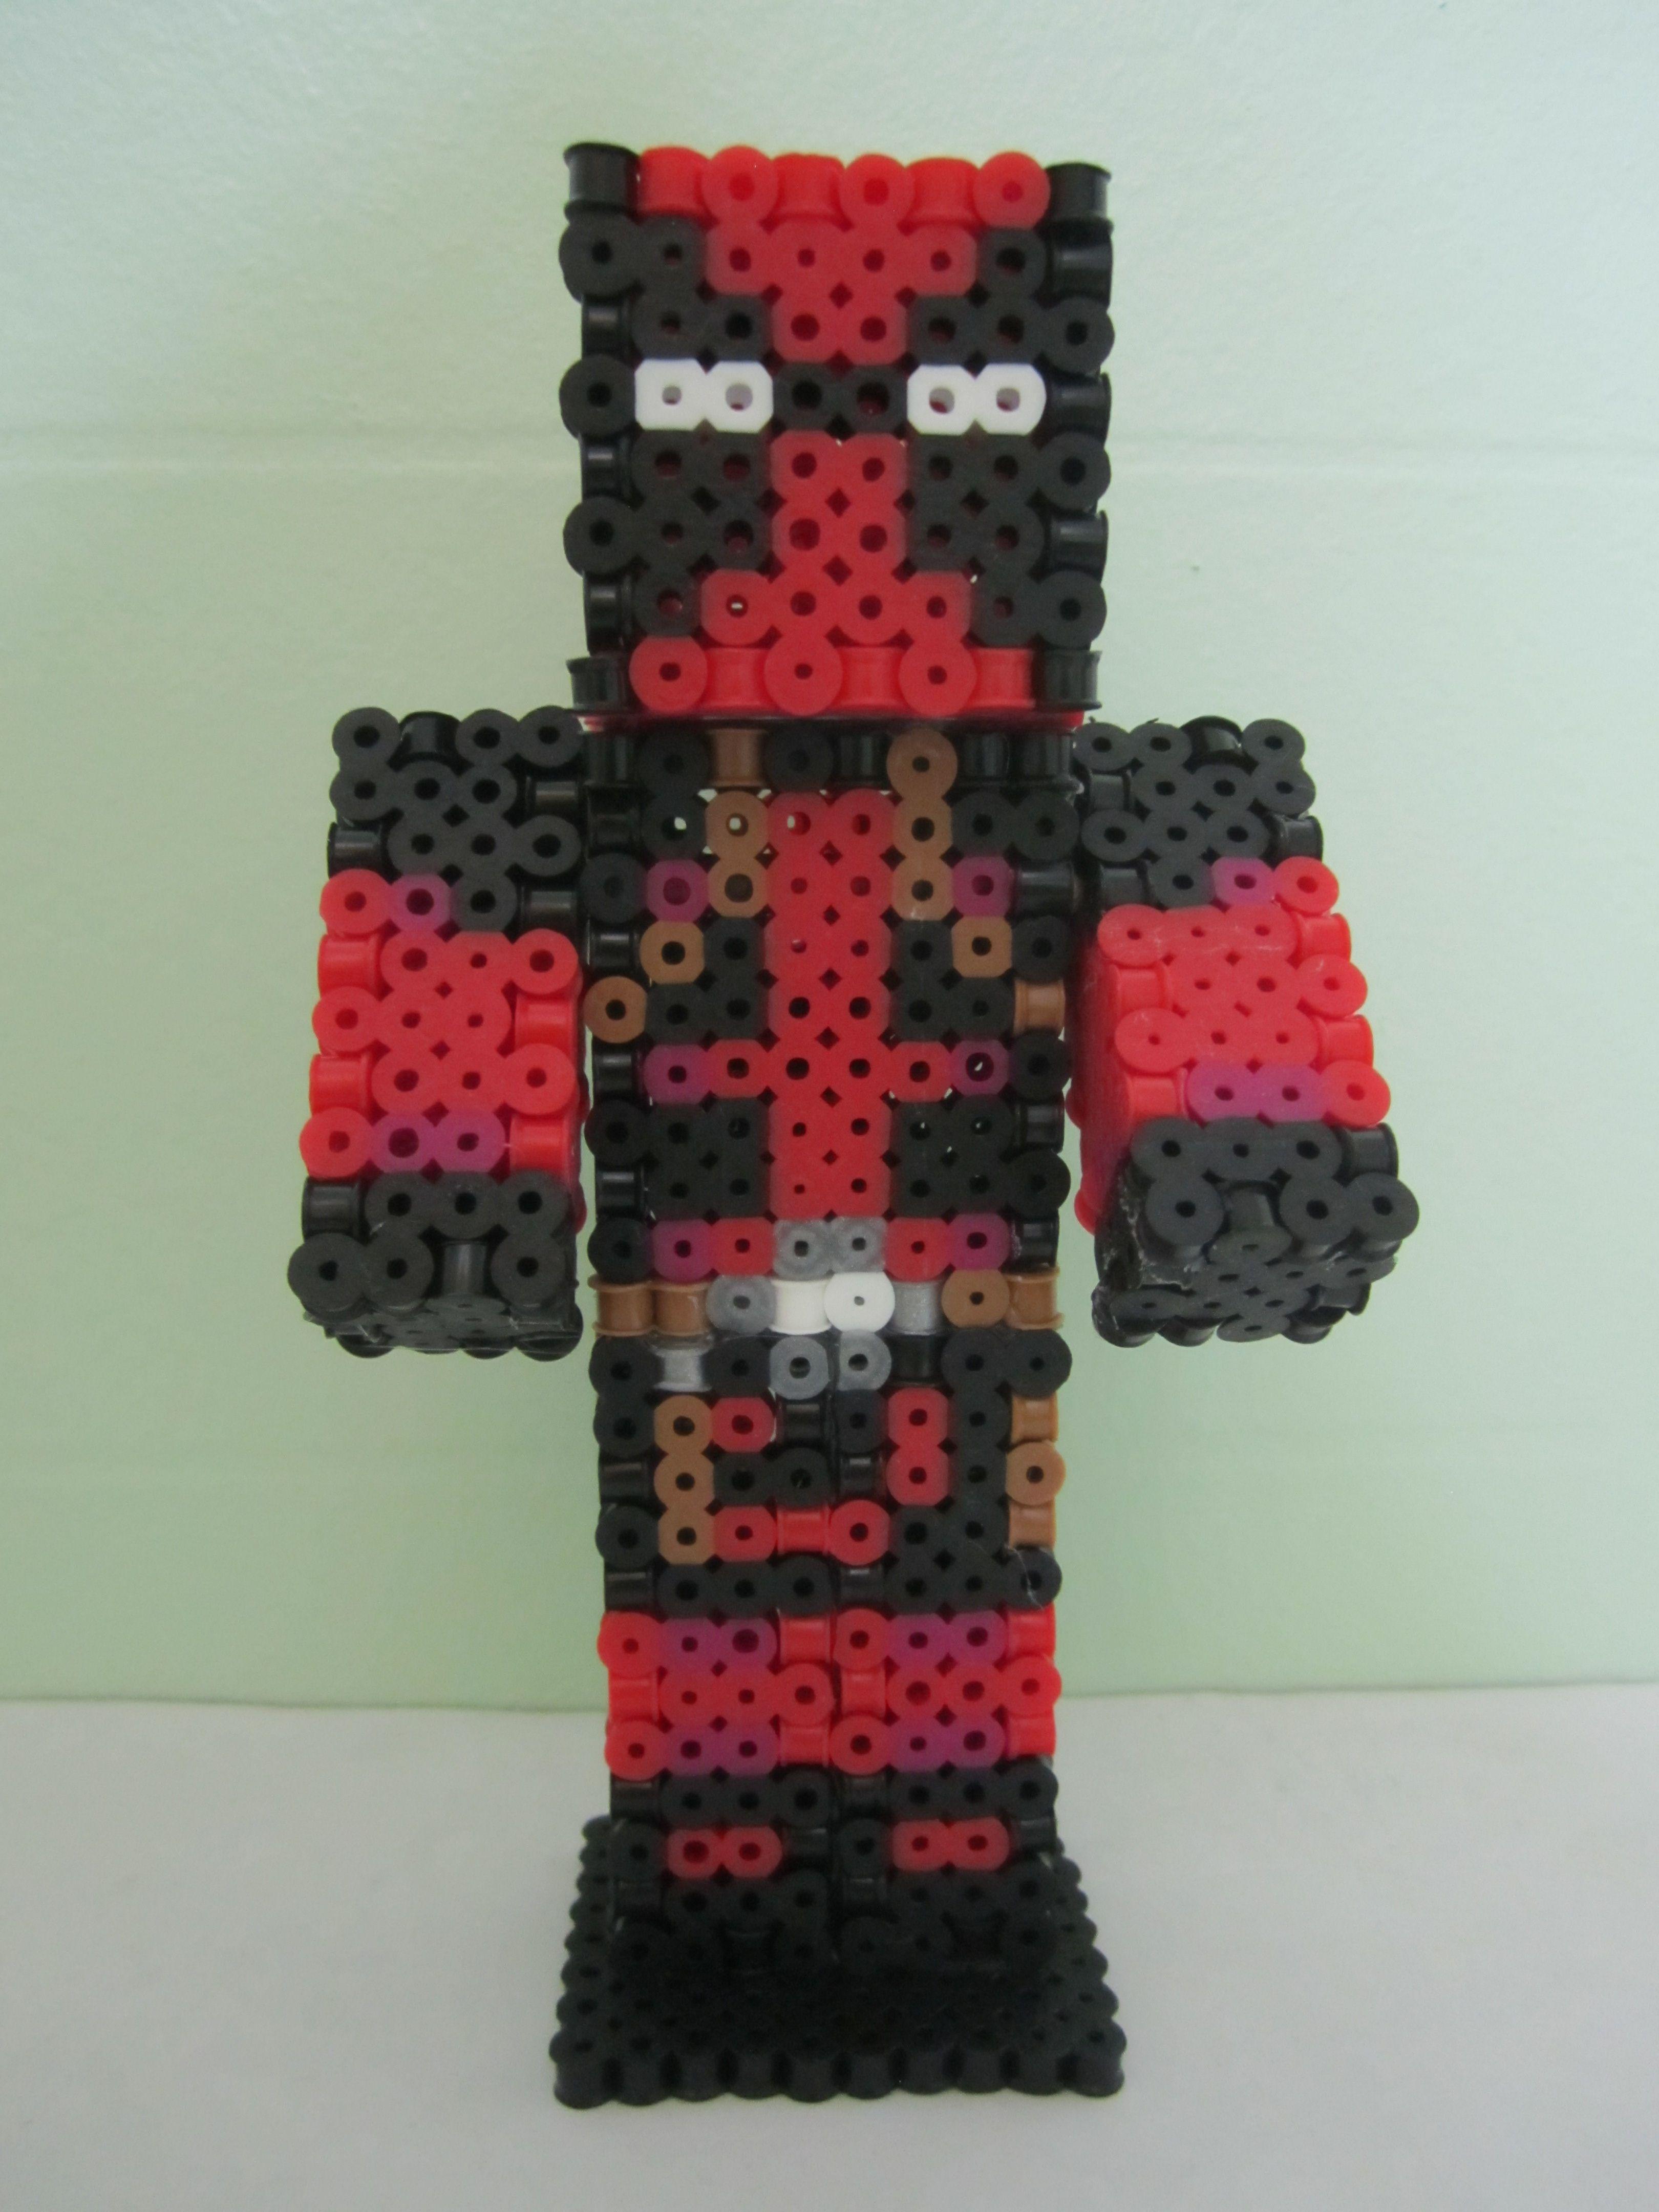 Deadpool Minecraft Skin DPerler Beads Perler Beads Pinterest - Deadpool skins fur minecraft